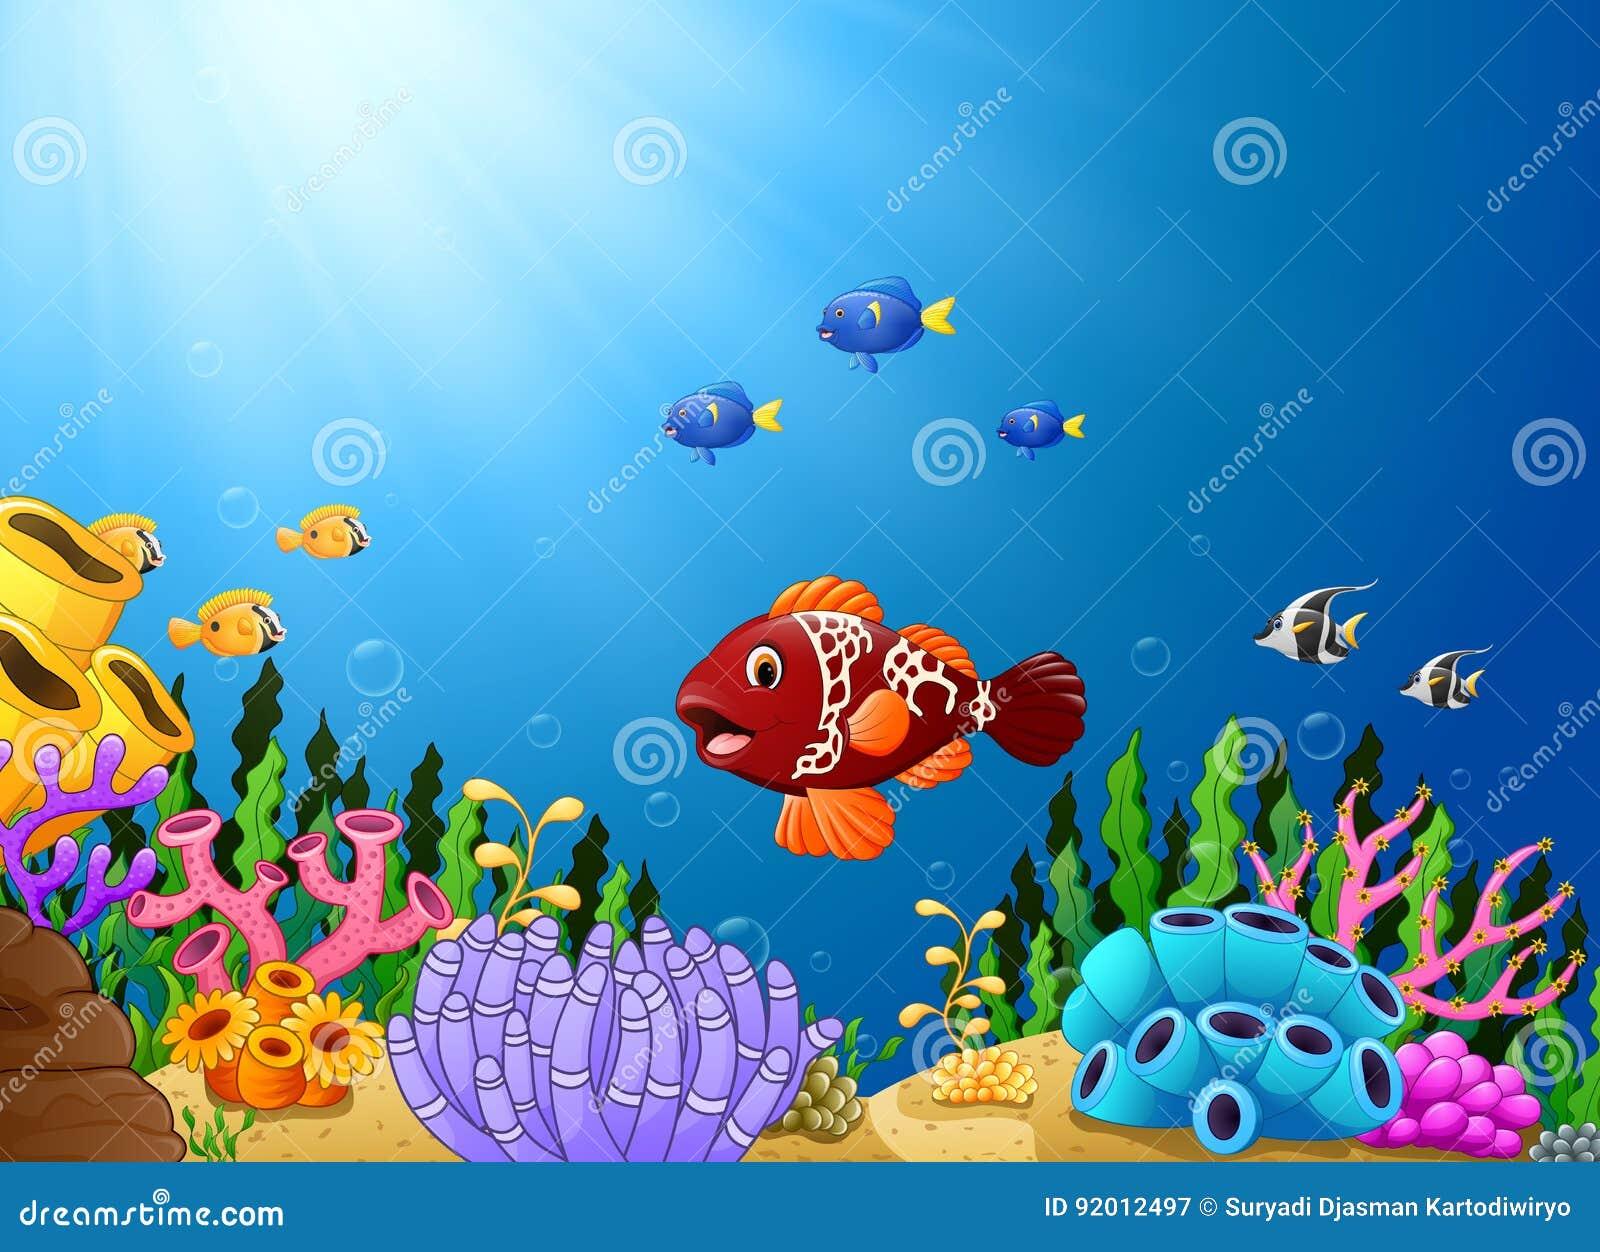 Cartoon tropical fish beautiful underwater world stock illustrations cartoon tropical fish beautiful underwater world stock illustrations 147 cartoon tropical fish beautiful underwater world stock illustrations publicscrutiny Images